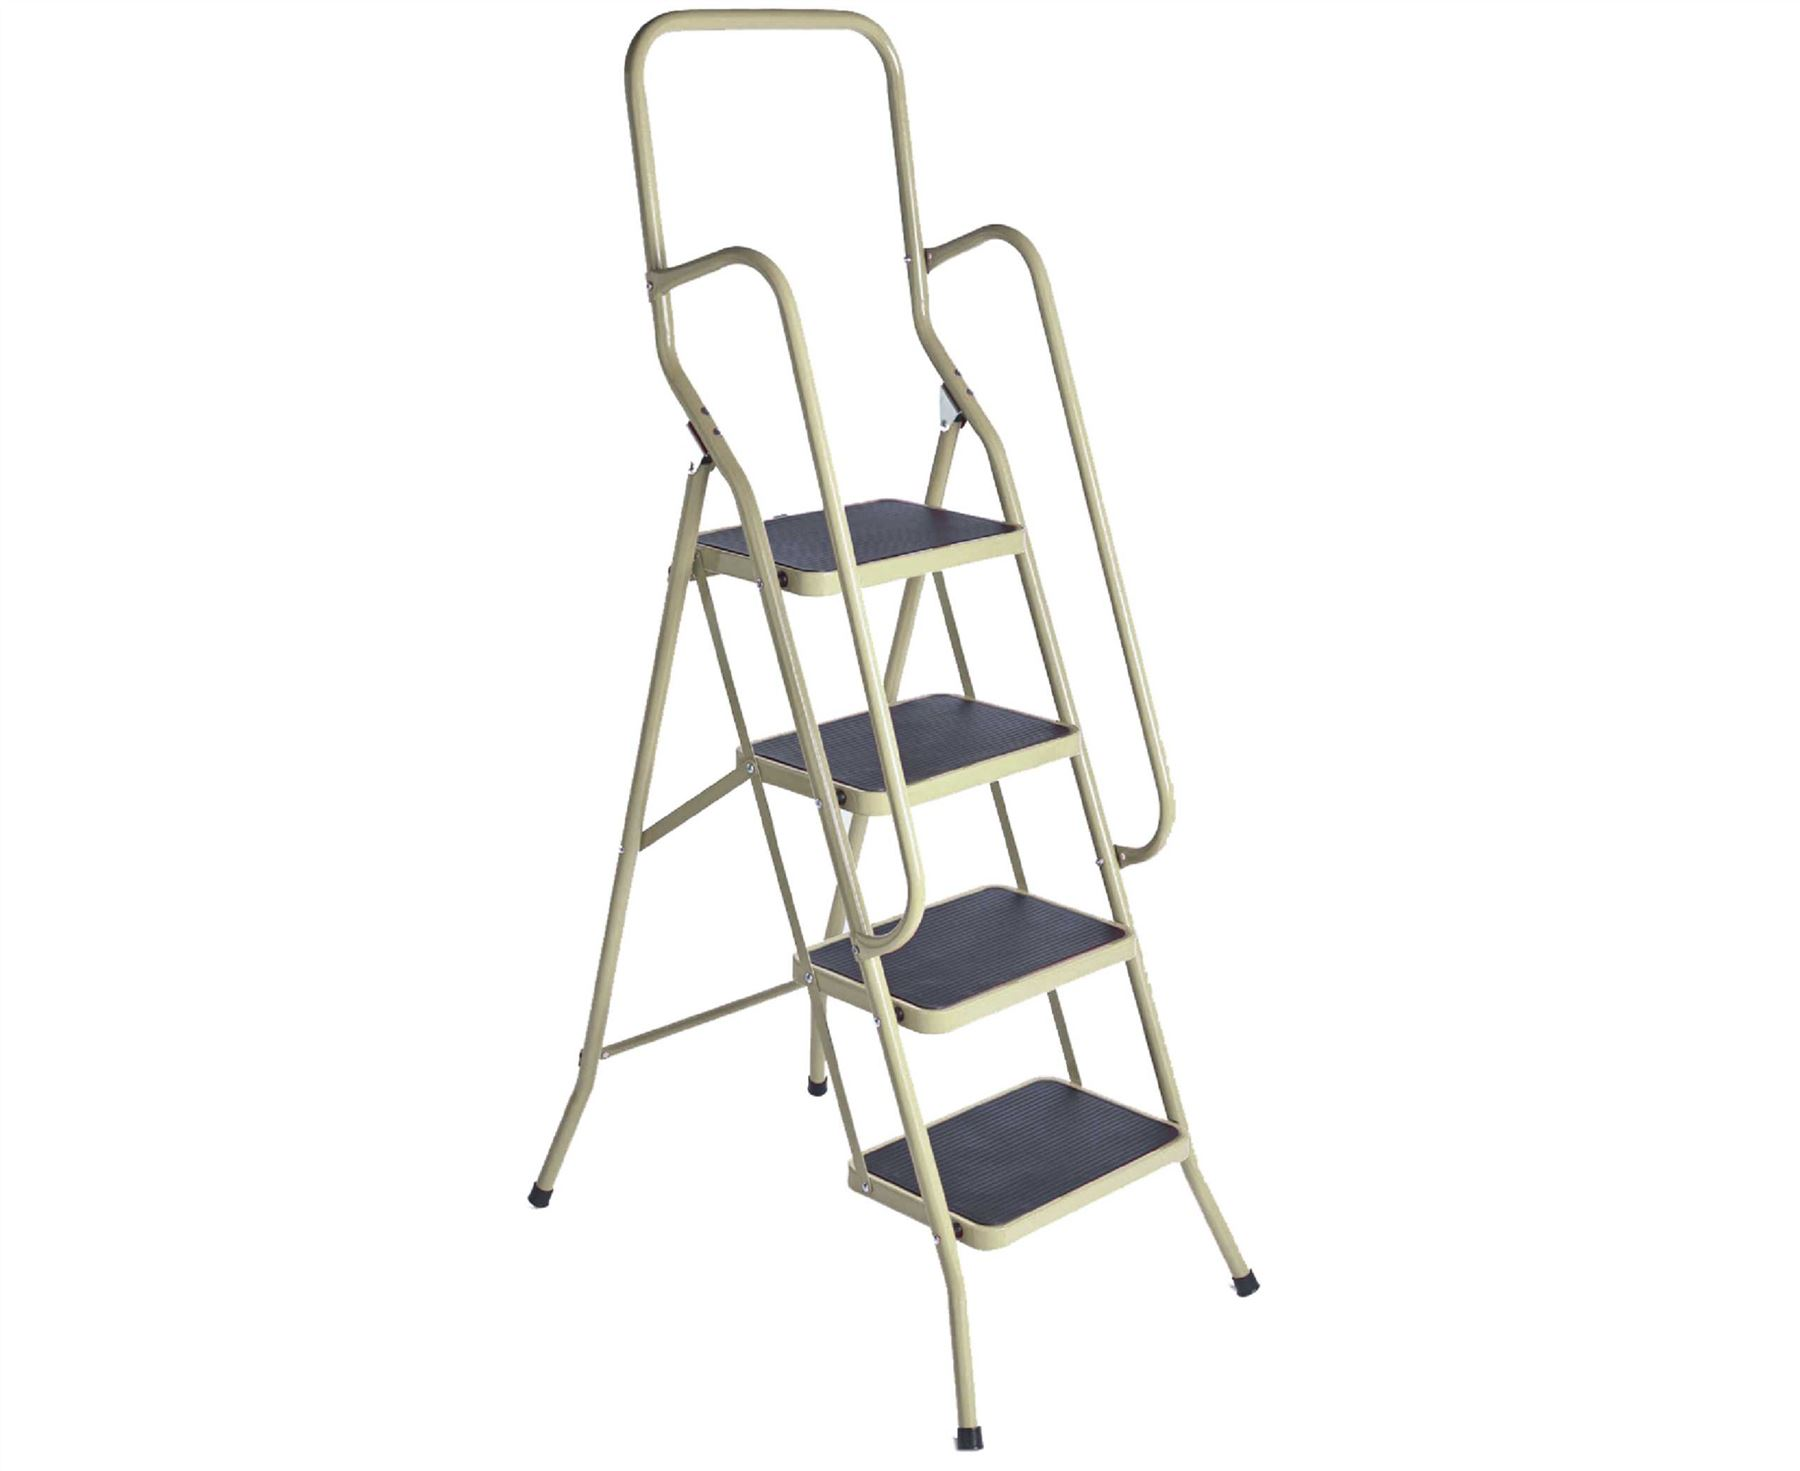 4 Step Safety Ladder Foldable Non Slip Tread Stepladder